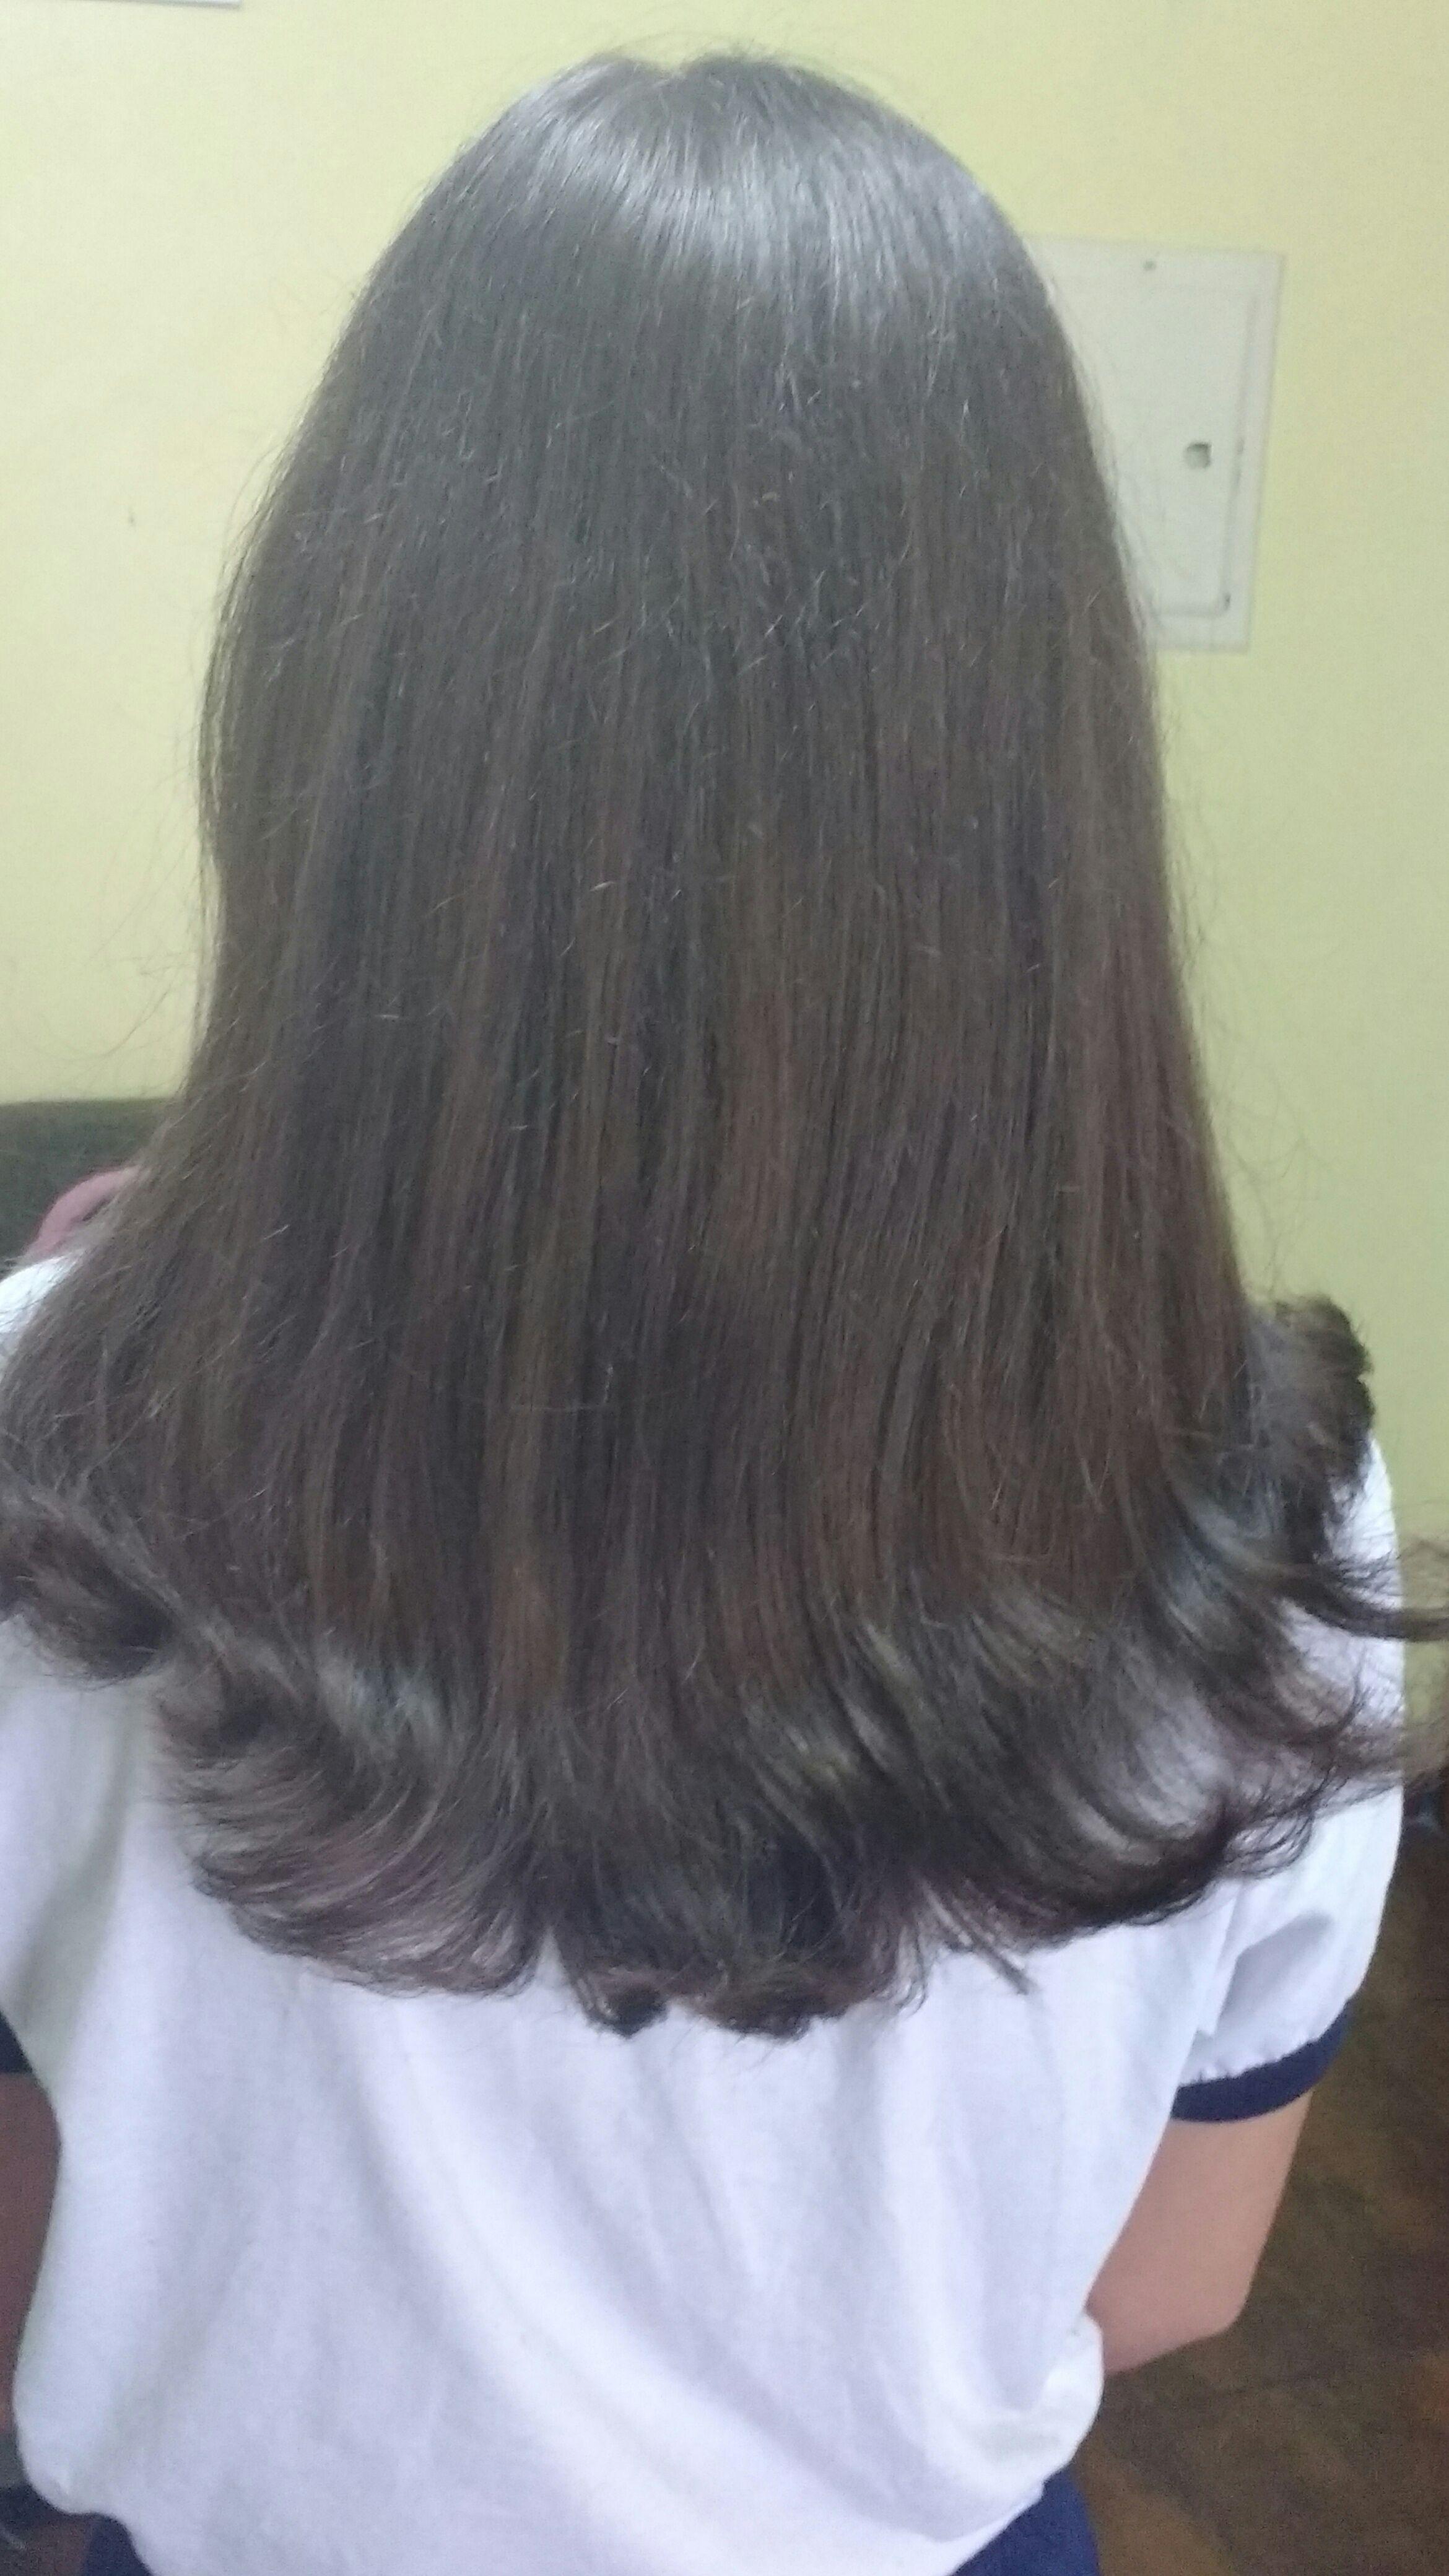 cabelo esteticista consultor(a) depilador(a) promotor(a) de vendas cabeleireiro(a) esteticista depilador(a) esteticista cabeleireiro(a)